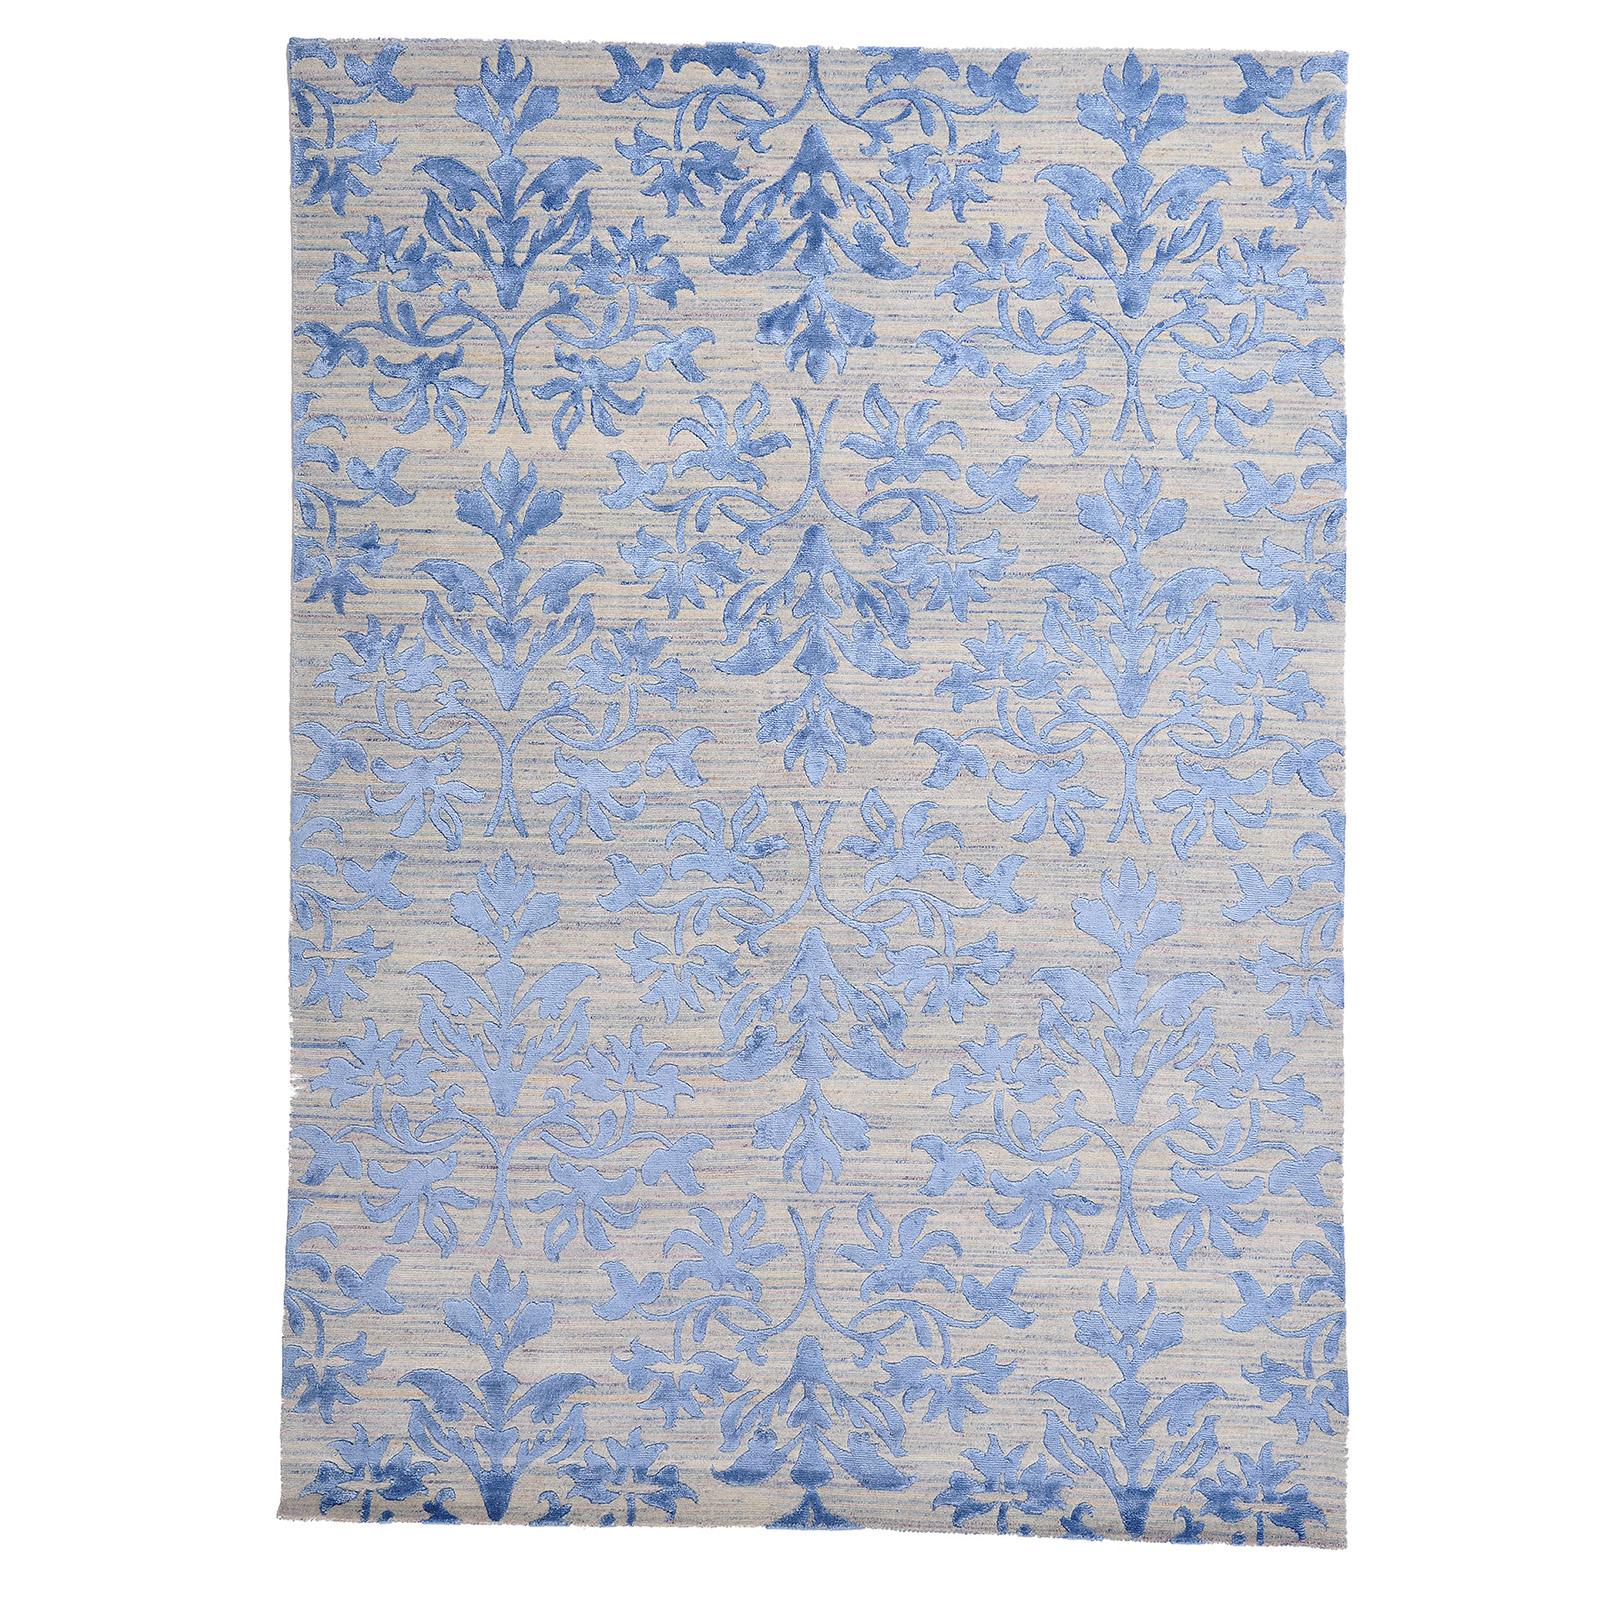 Damask (lilja blå) matta storlek 240x170 cm